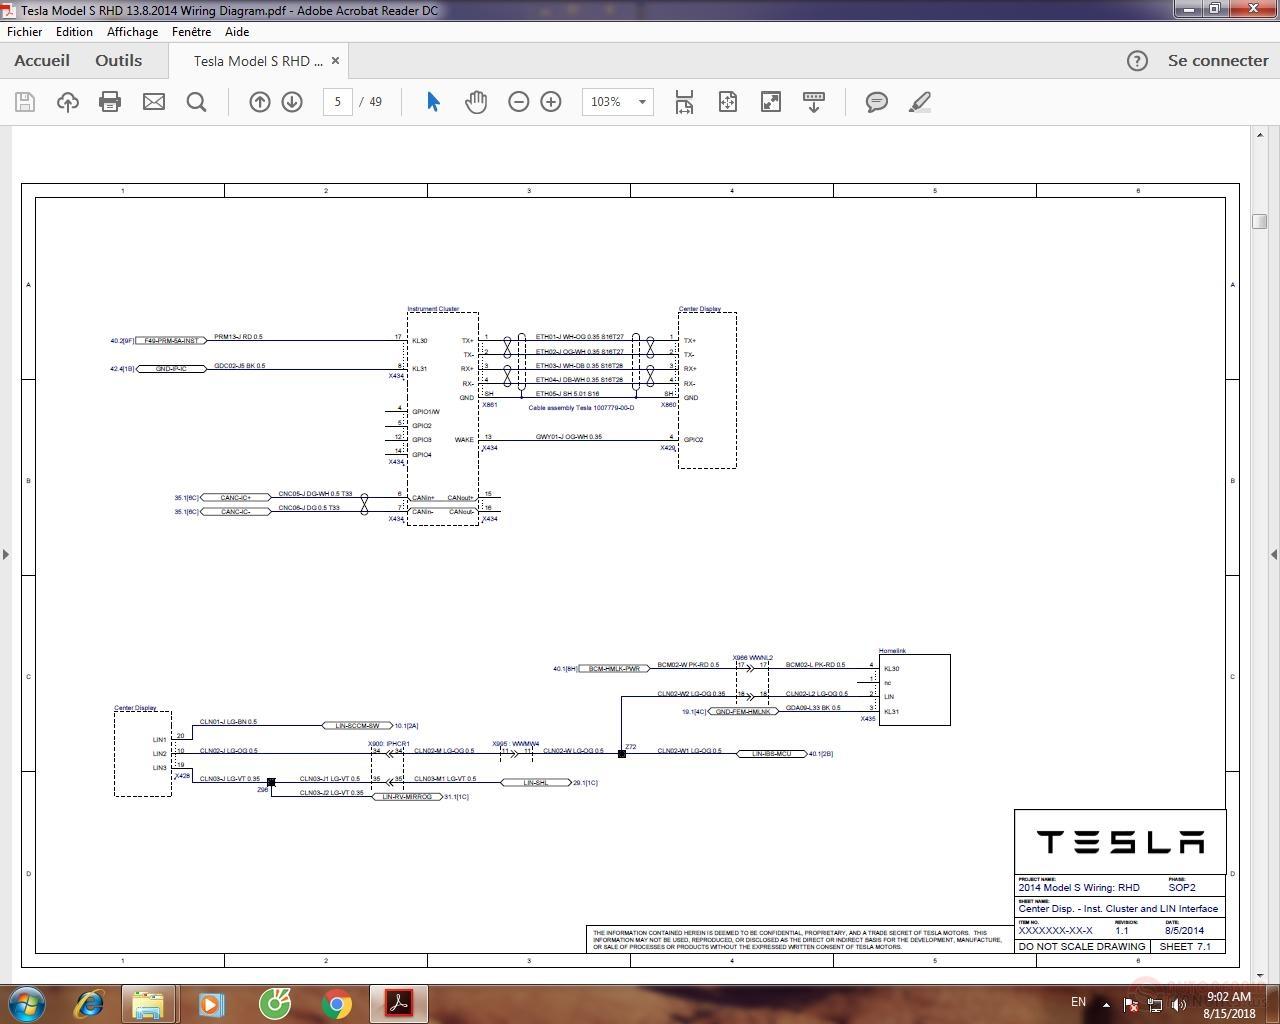 Tesla Model S Rhd 1382014 Wiring Diagram Auto Repair Manual Img